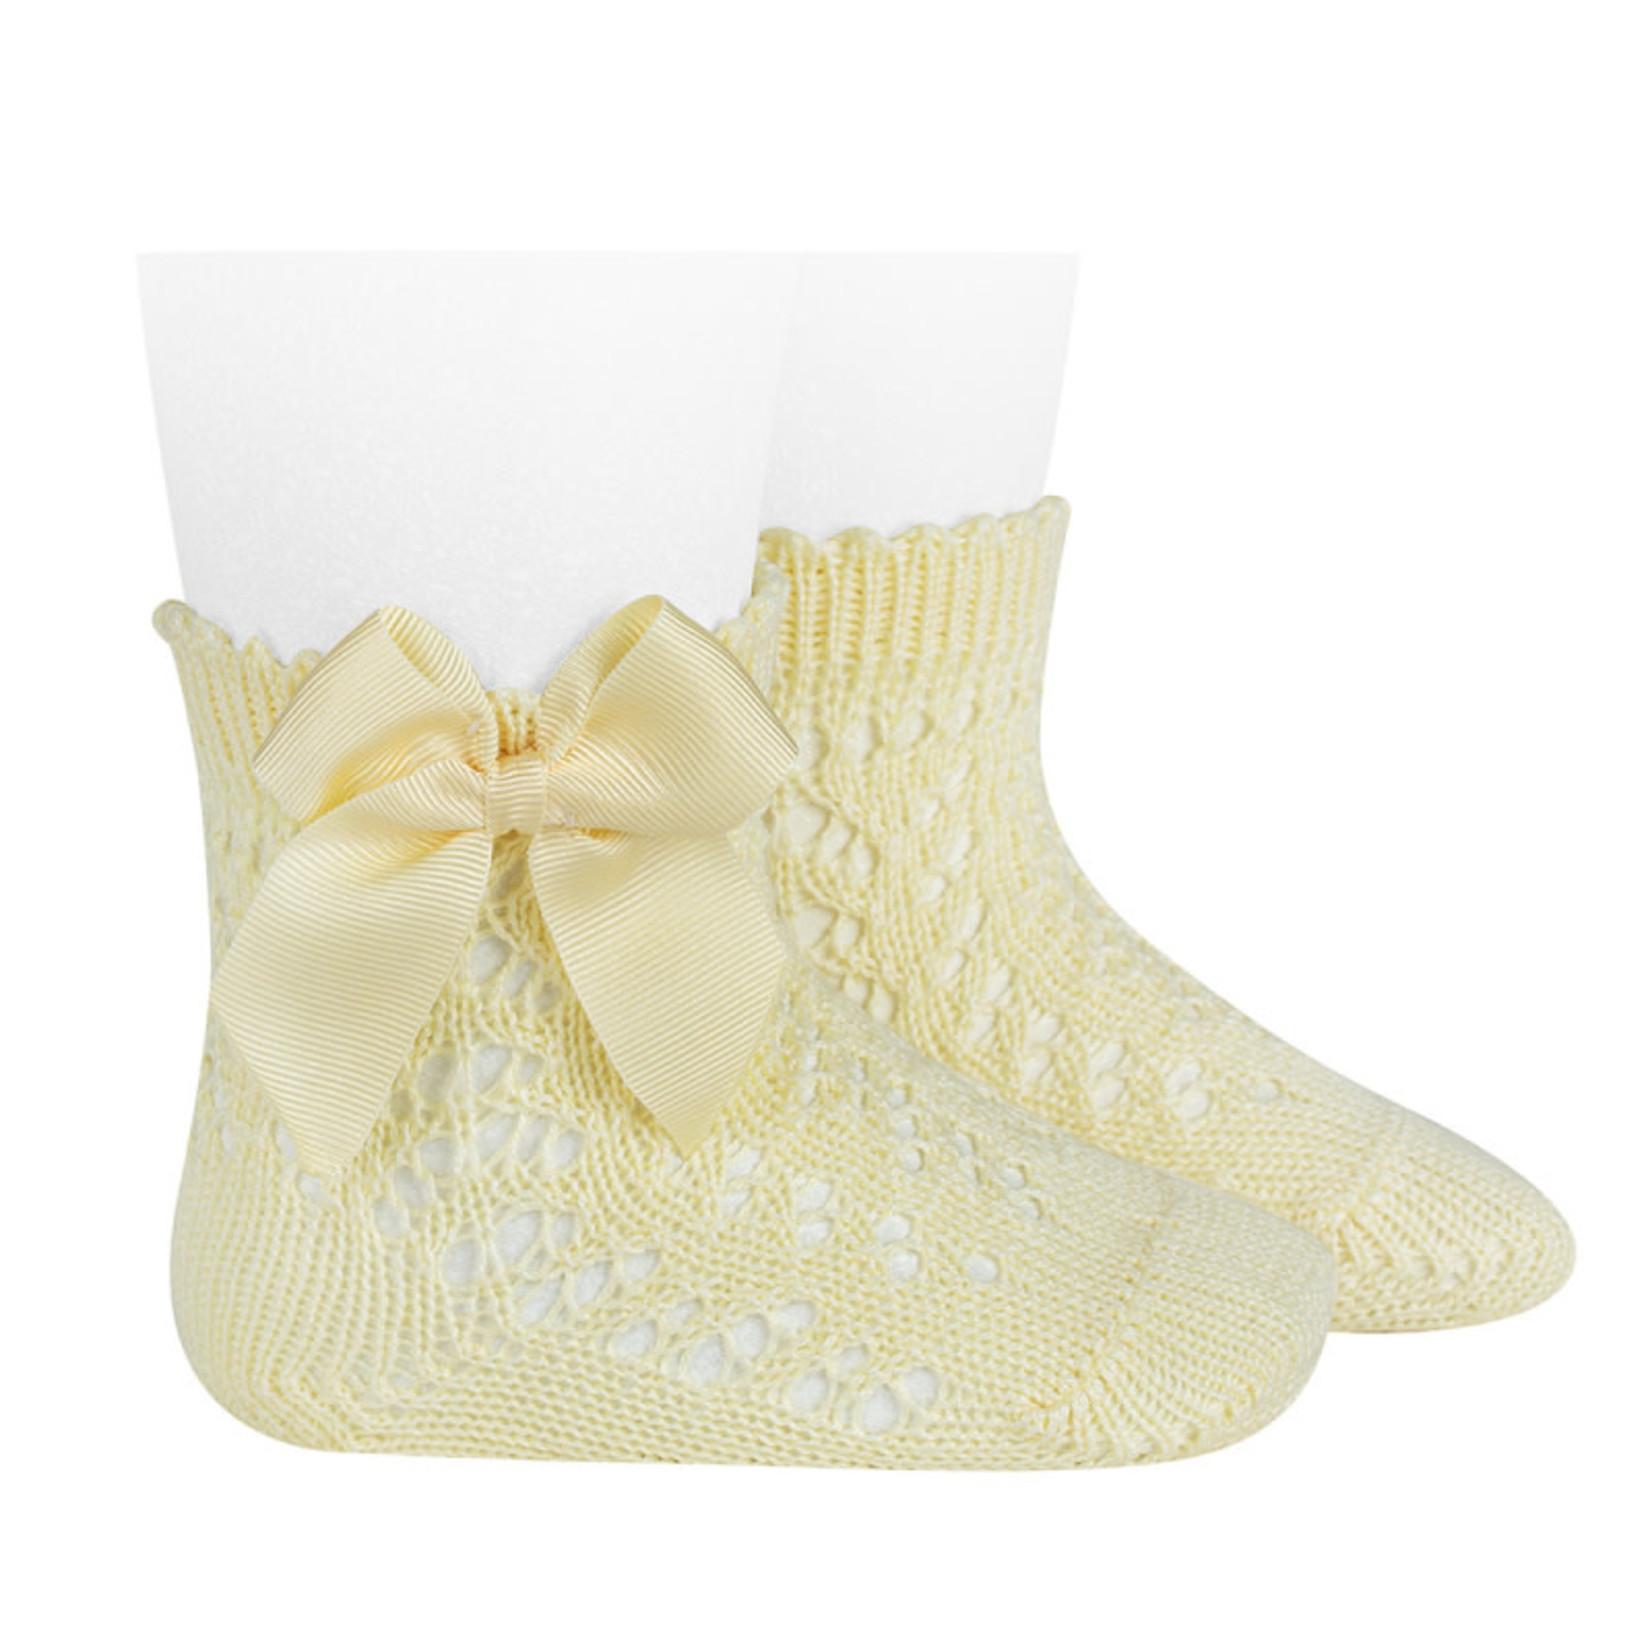 Condor Socks Open w/Bow - Pale Yellow